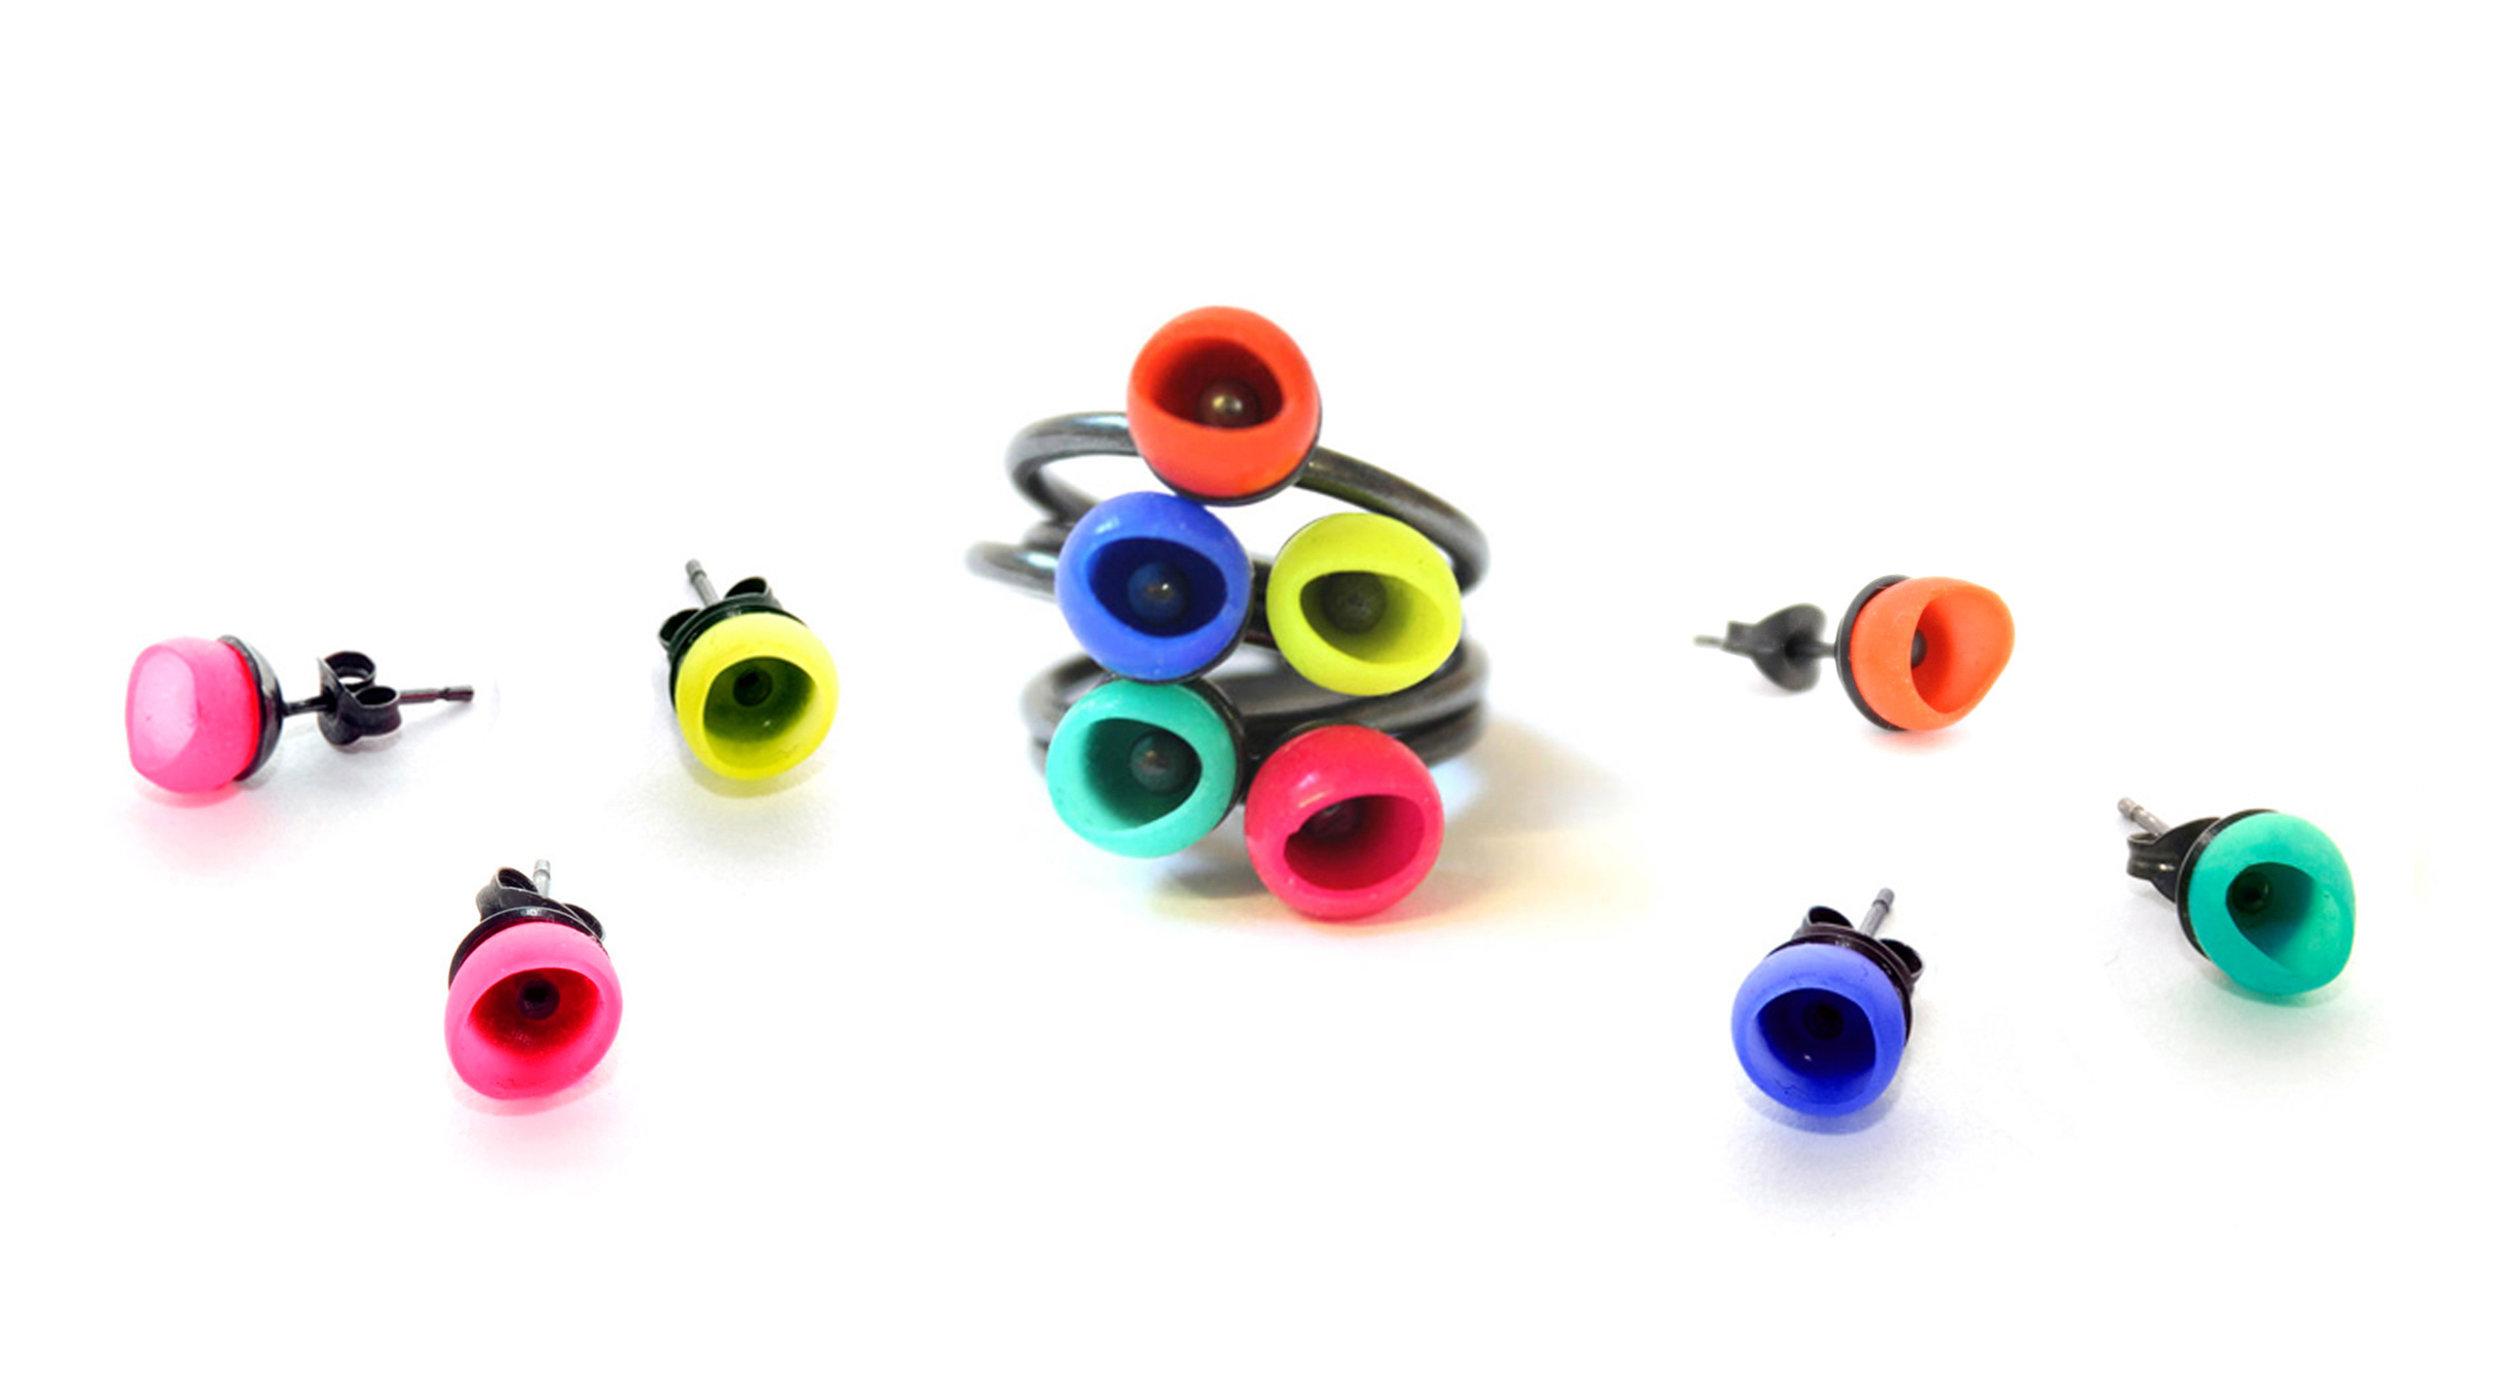 7 Jenny Llewellyn - Mix Up Look Sharp rings and earrings - 300.jpg